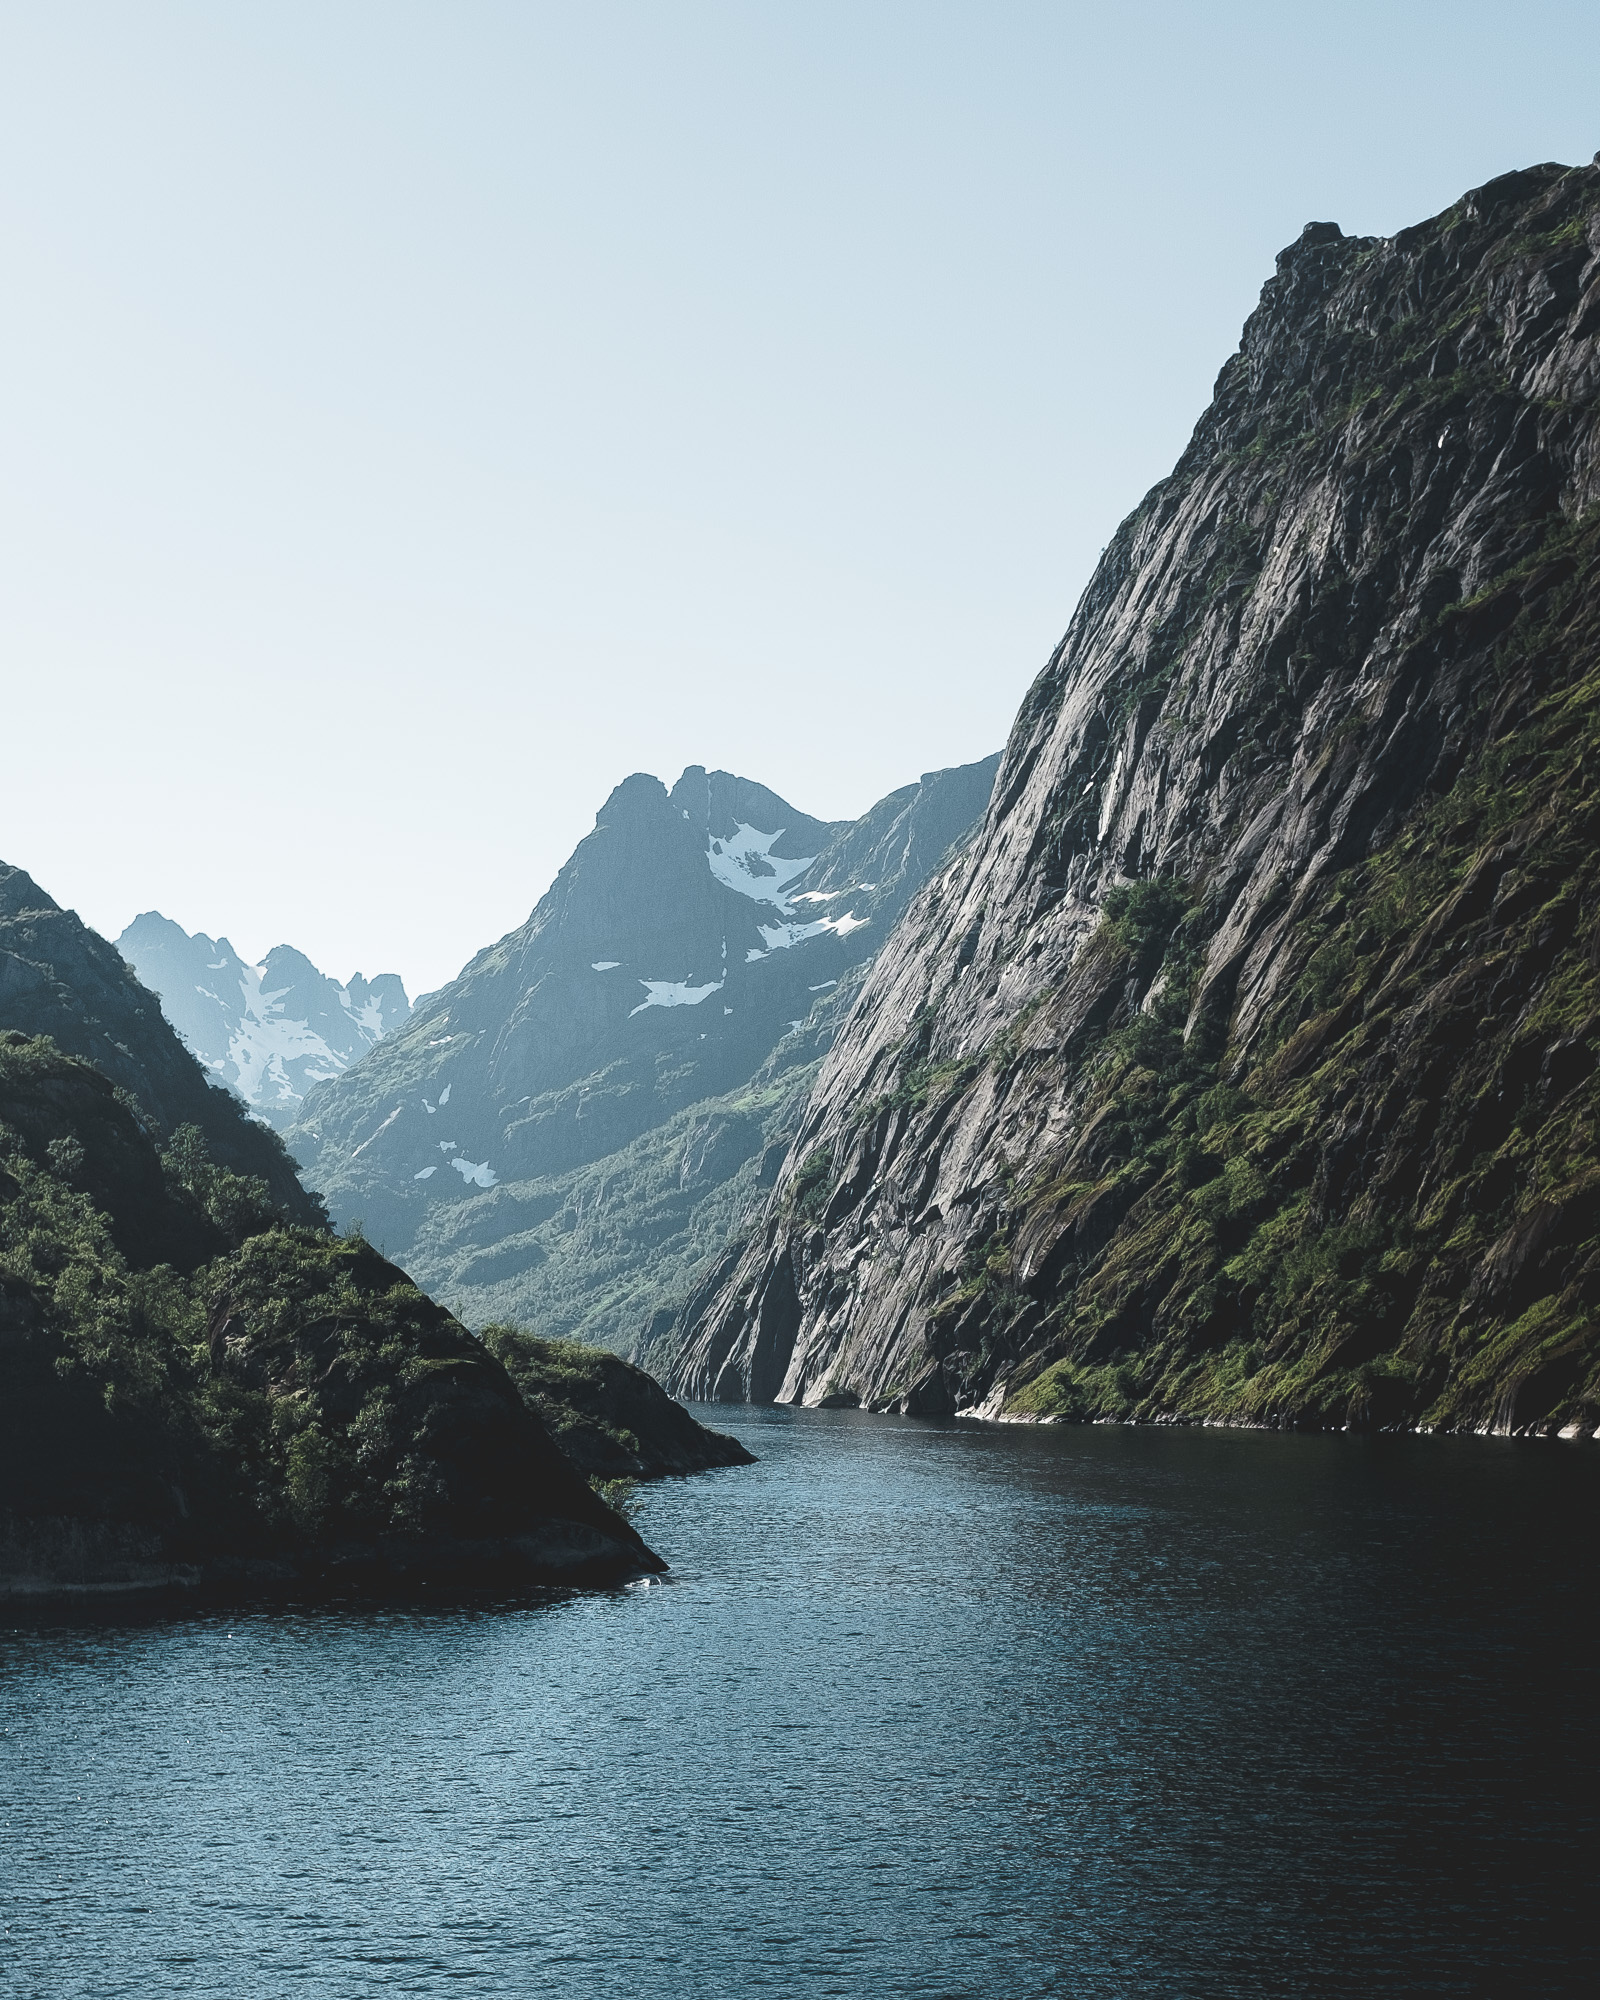 201707_Norway_Stuart McMillan Photography_2566.jpg